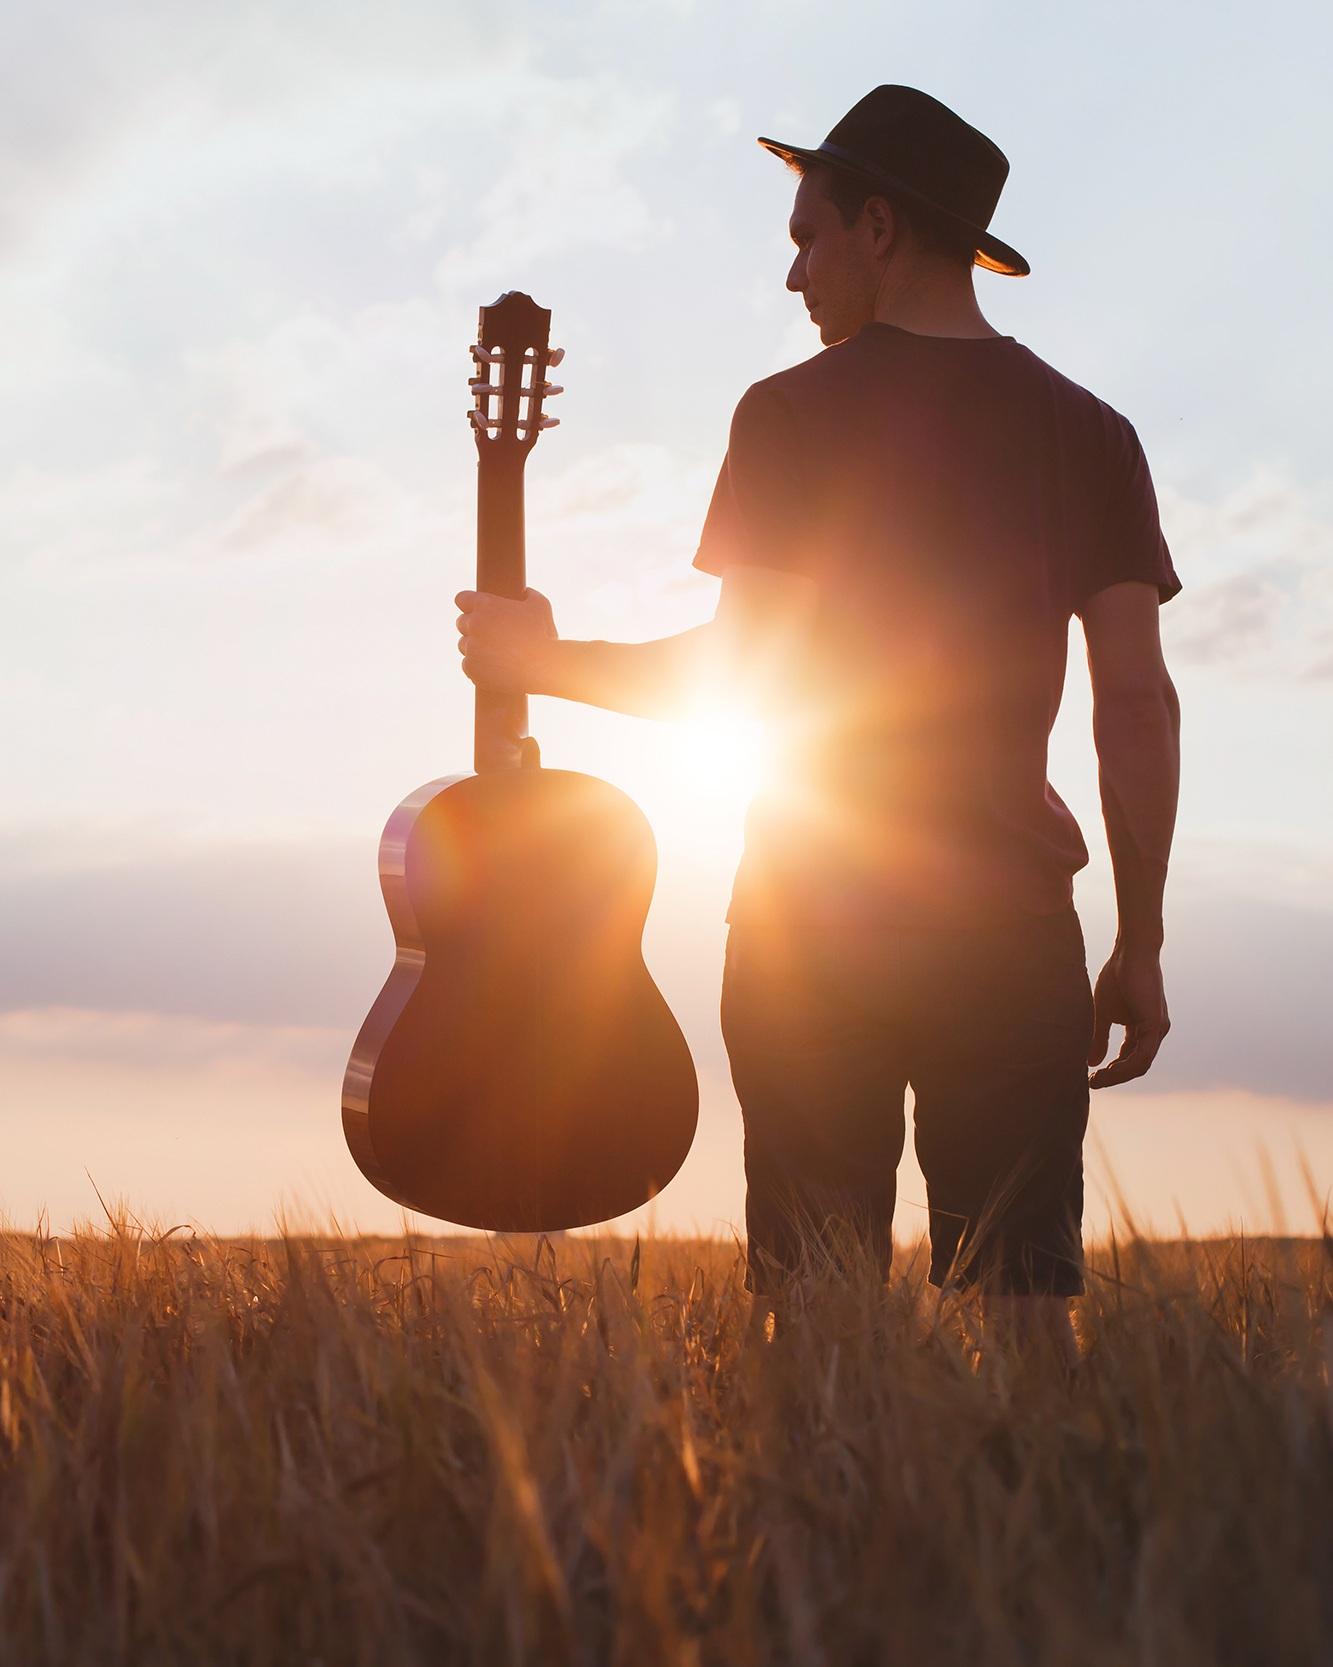 guitar_sunset.jpg